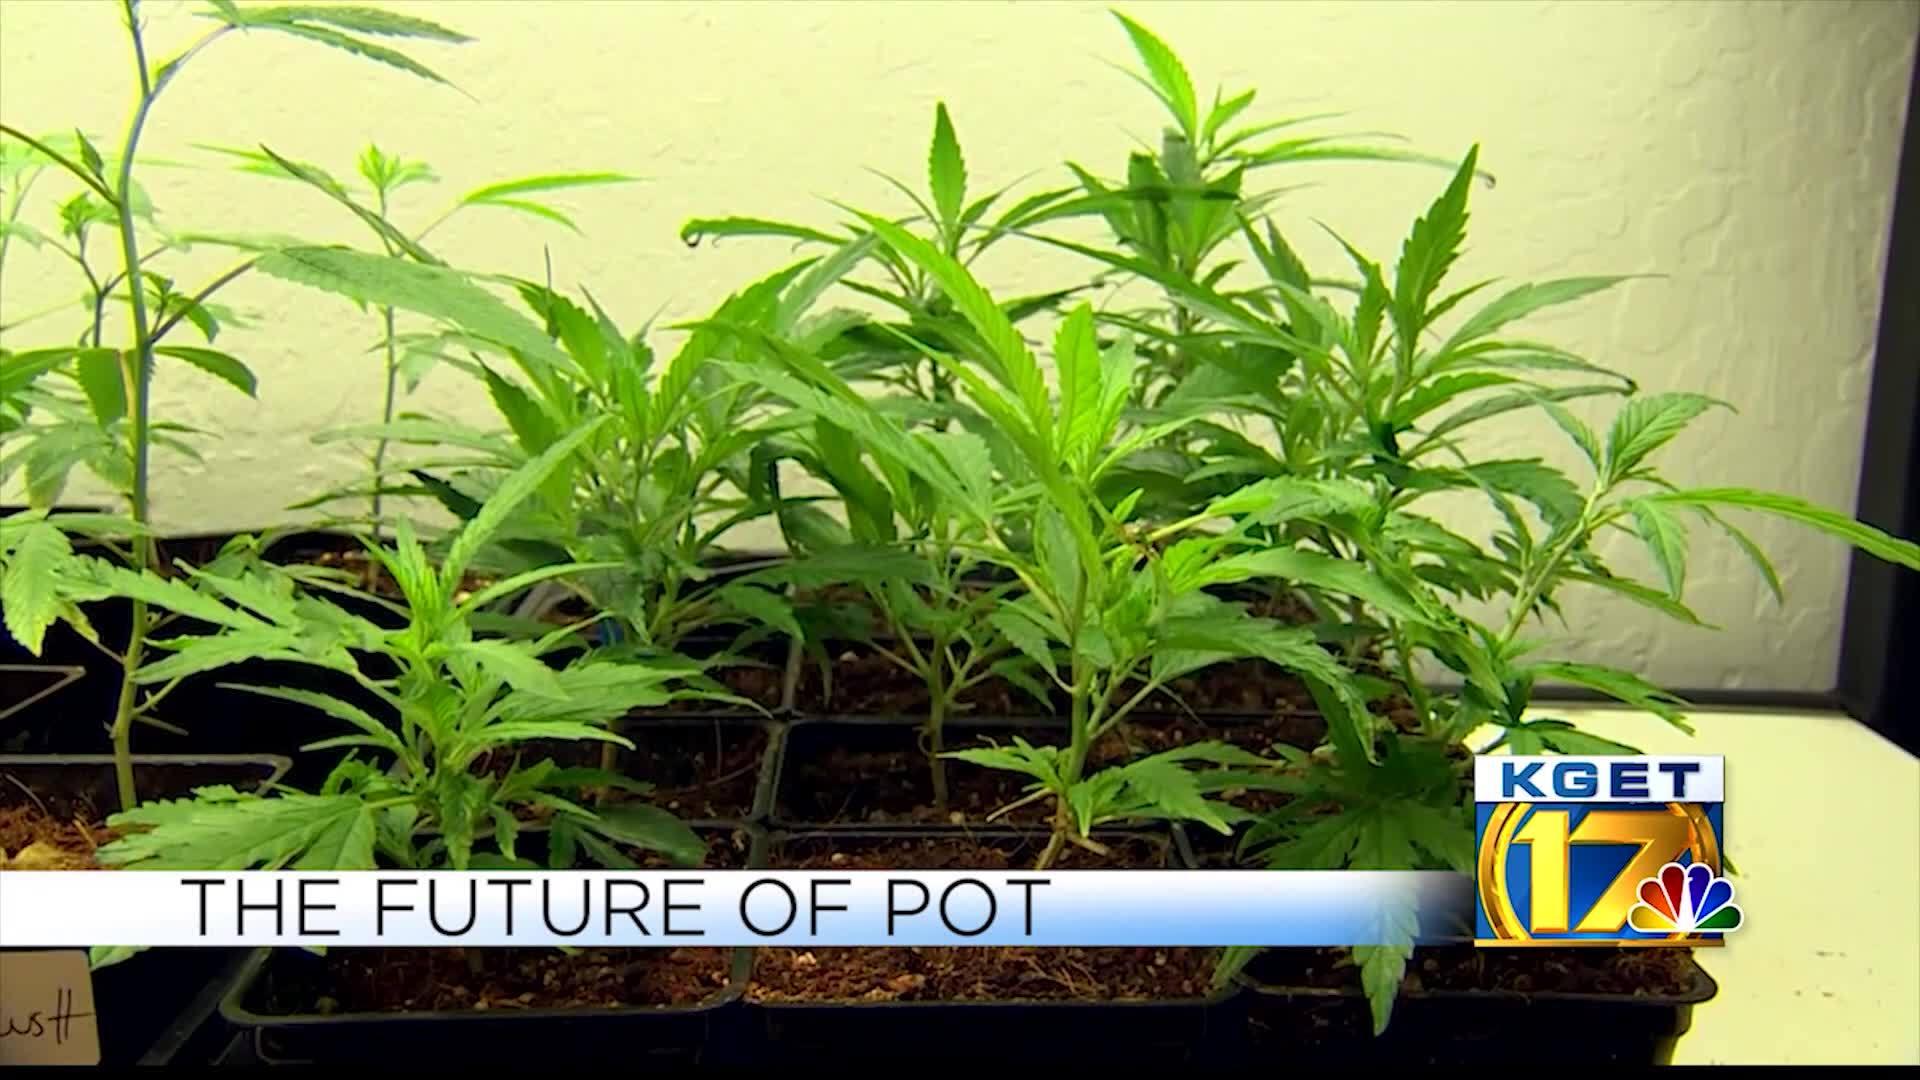 WEED_WARS__Marijuana_advocates_urge_supe_6_20190501014254